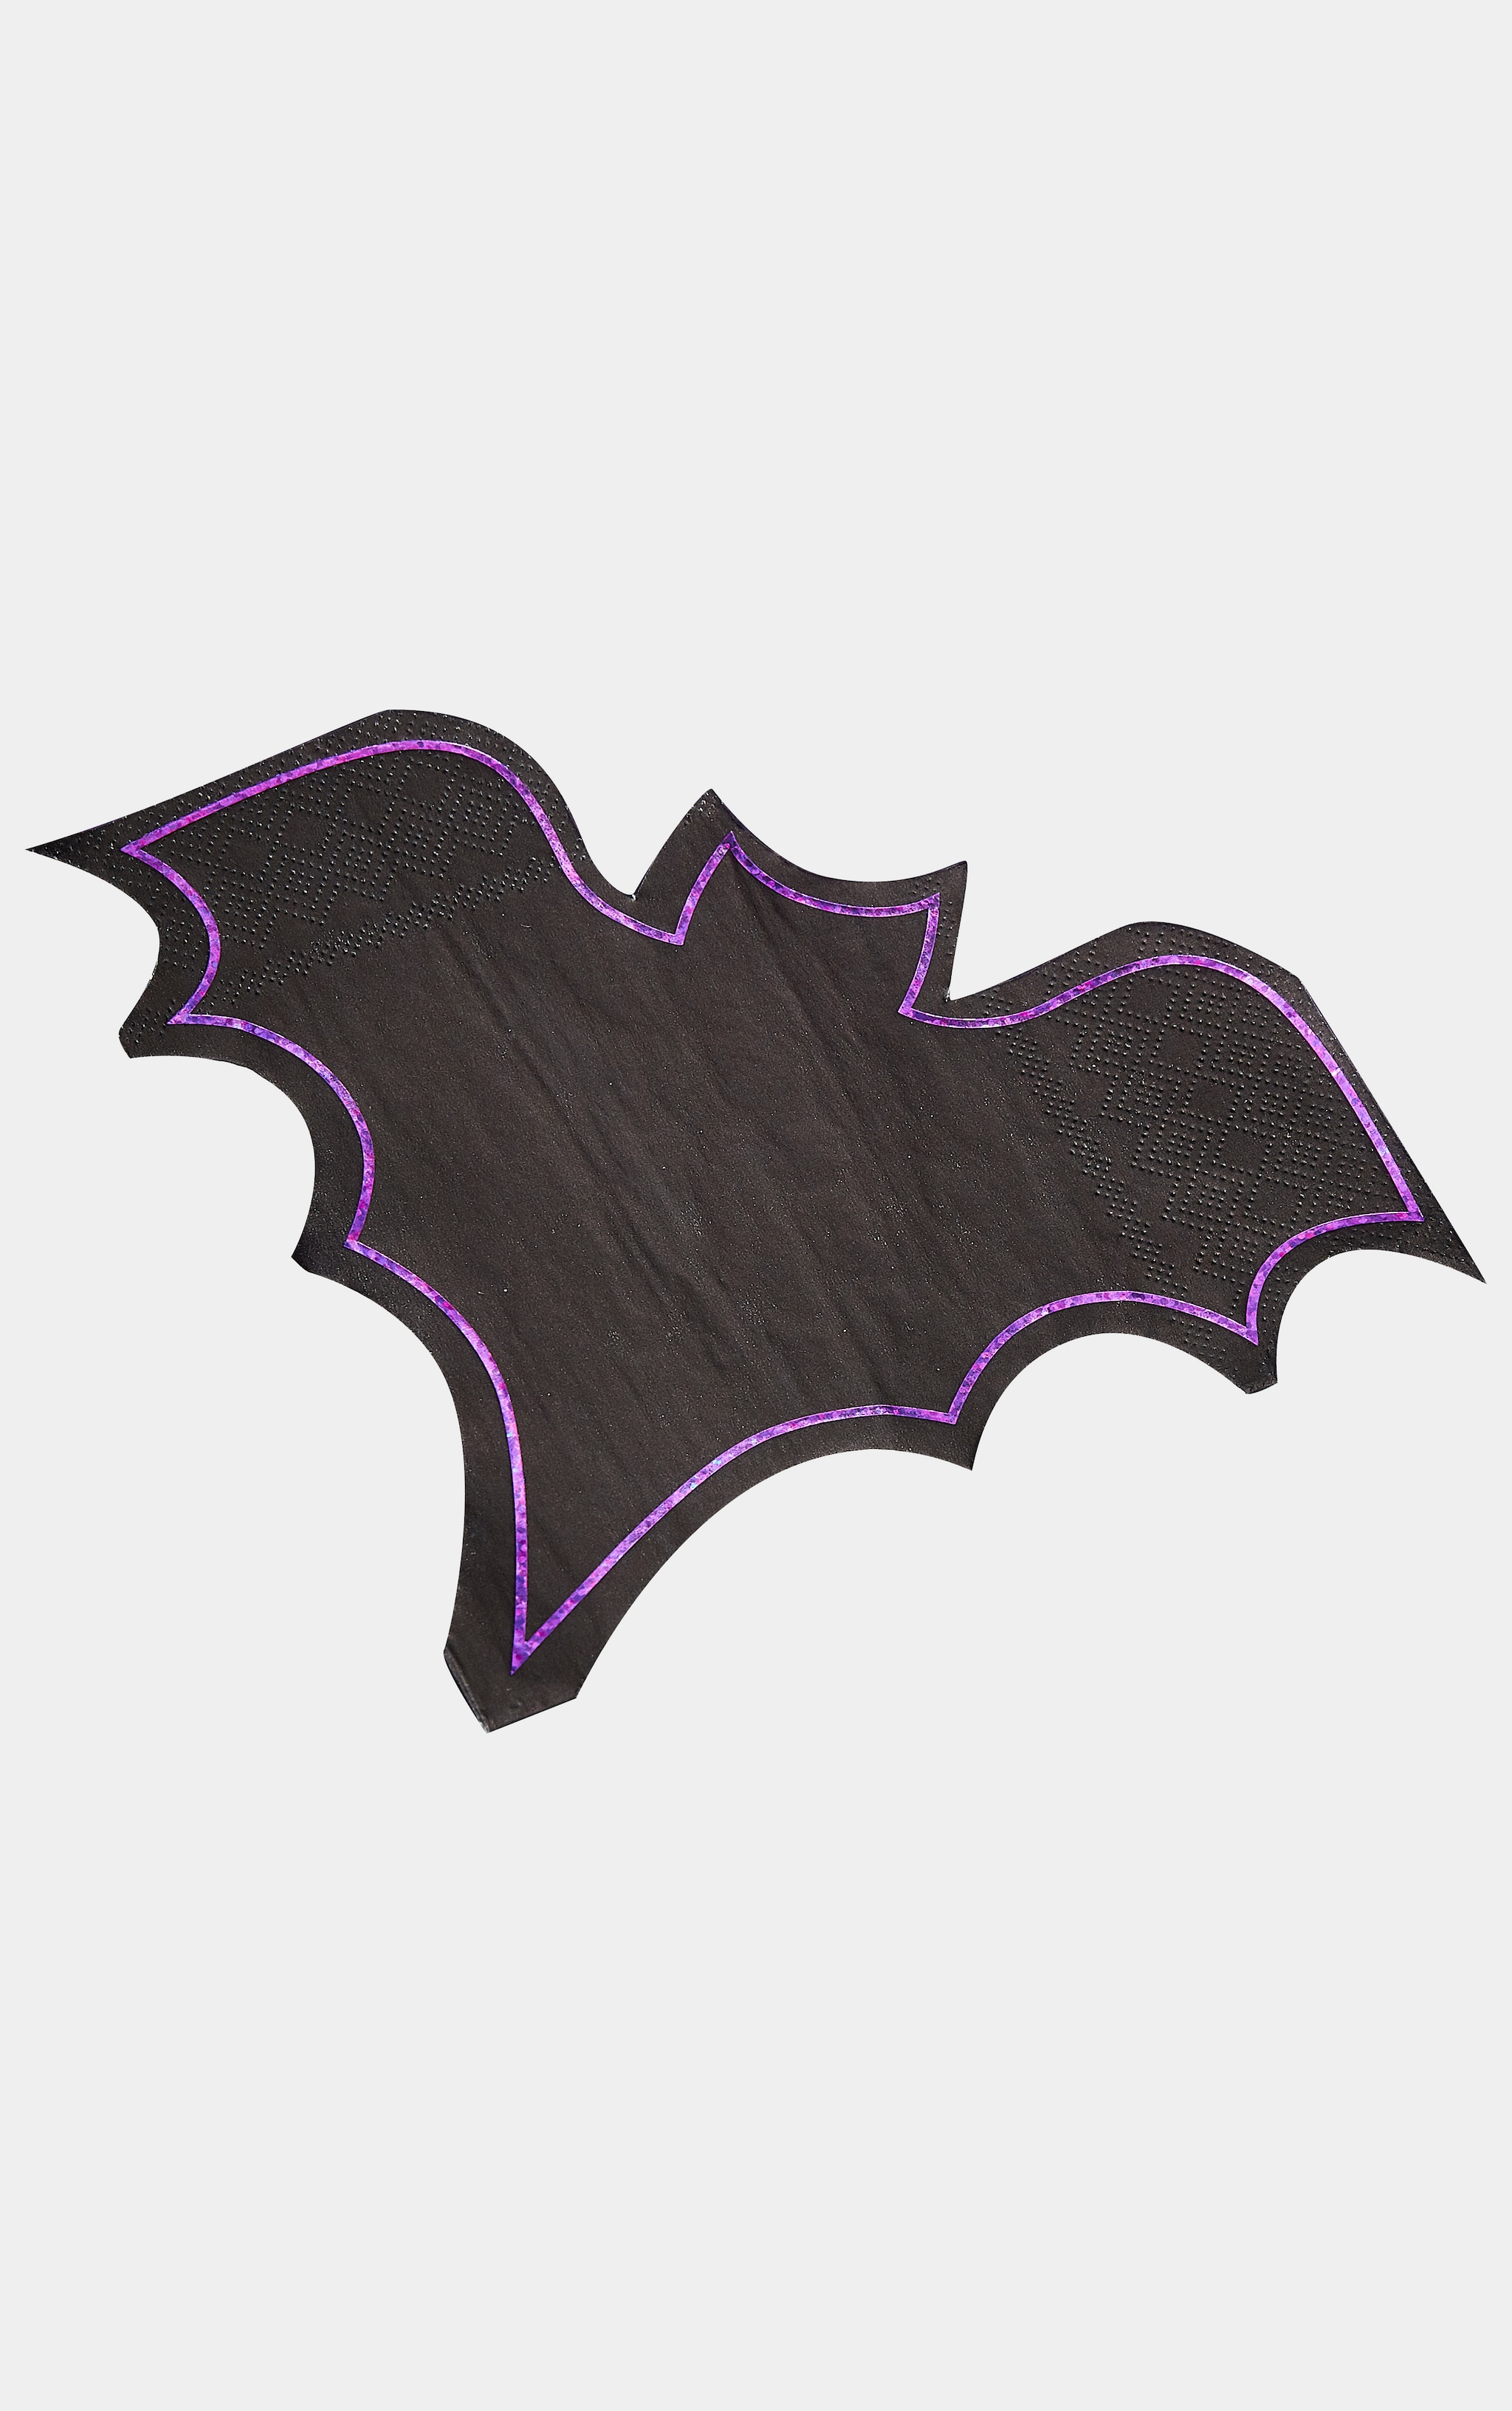 Ginger Ray Paper Napkins Bat Shaped Purple Foil 2